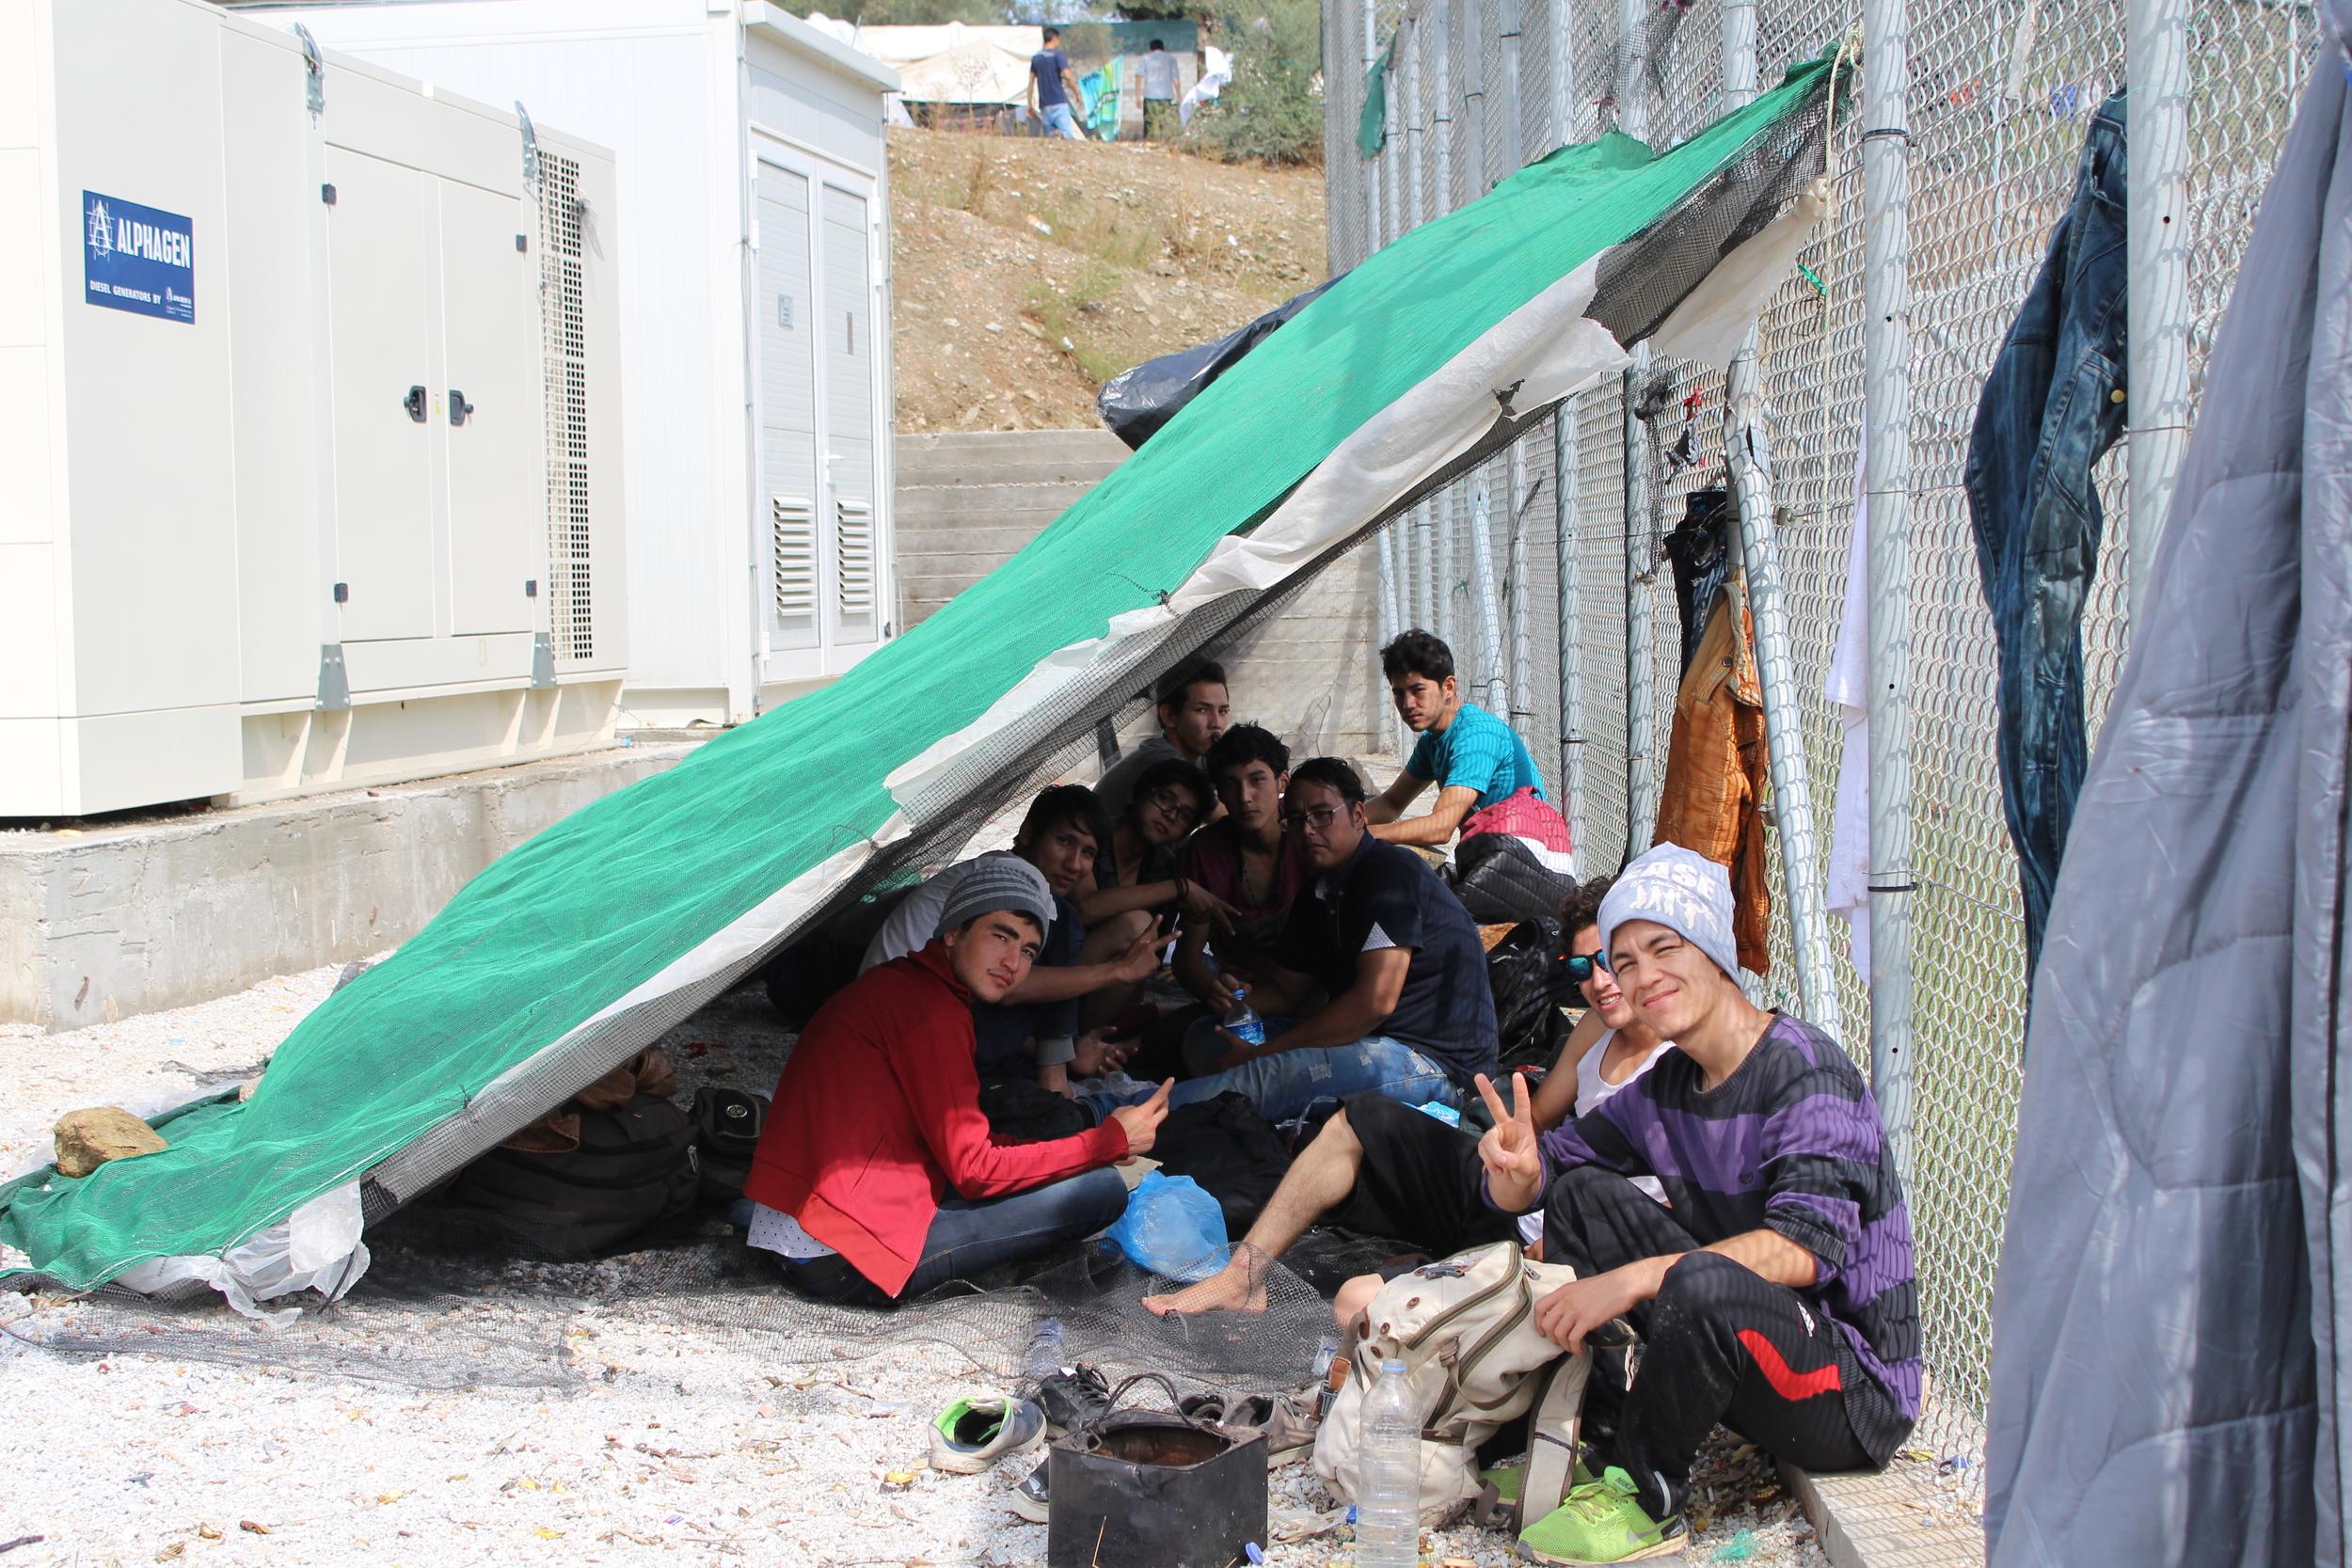 Shelters in Moria refugee camp (Daniel Elkan/IRIN)